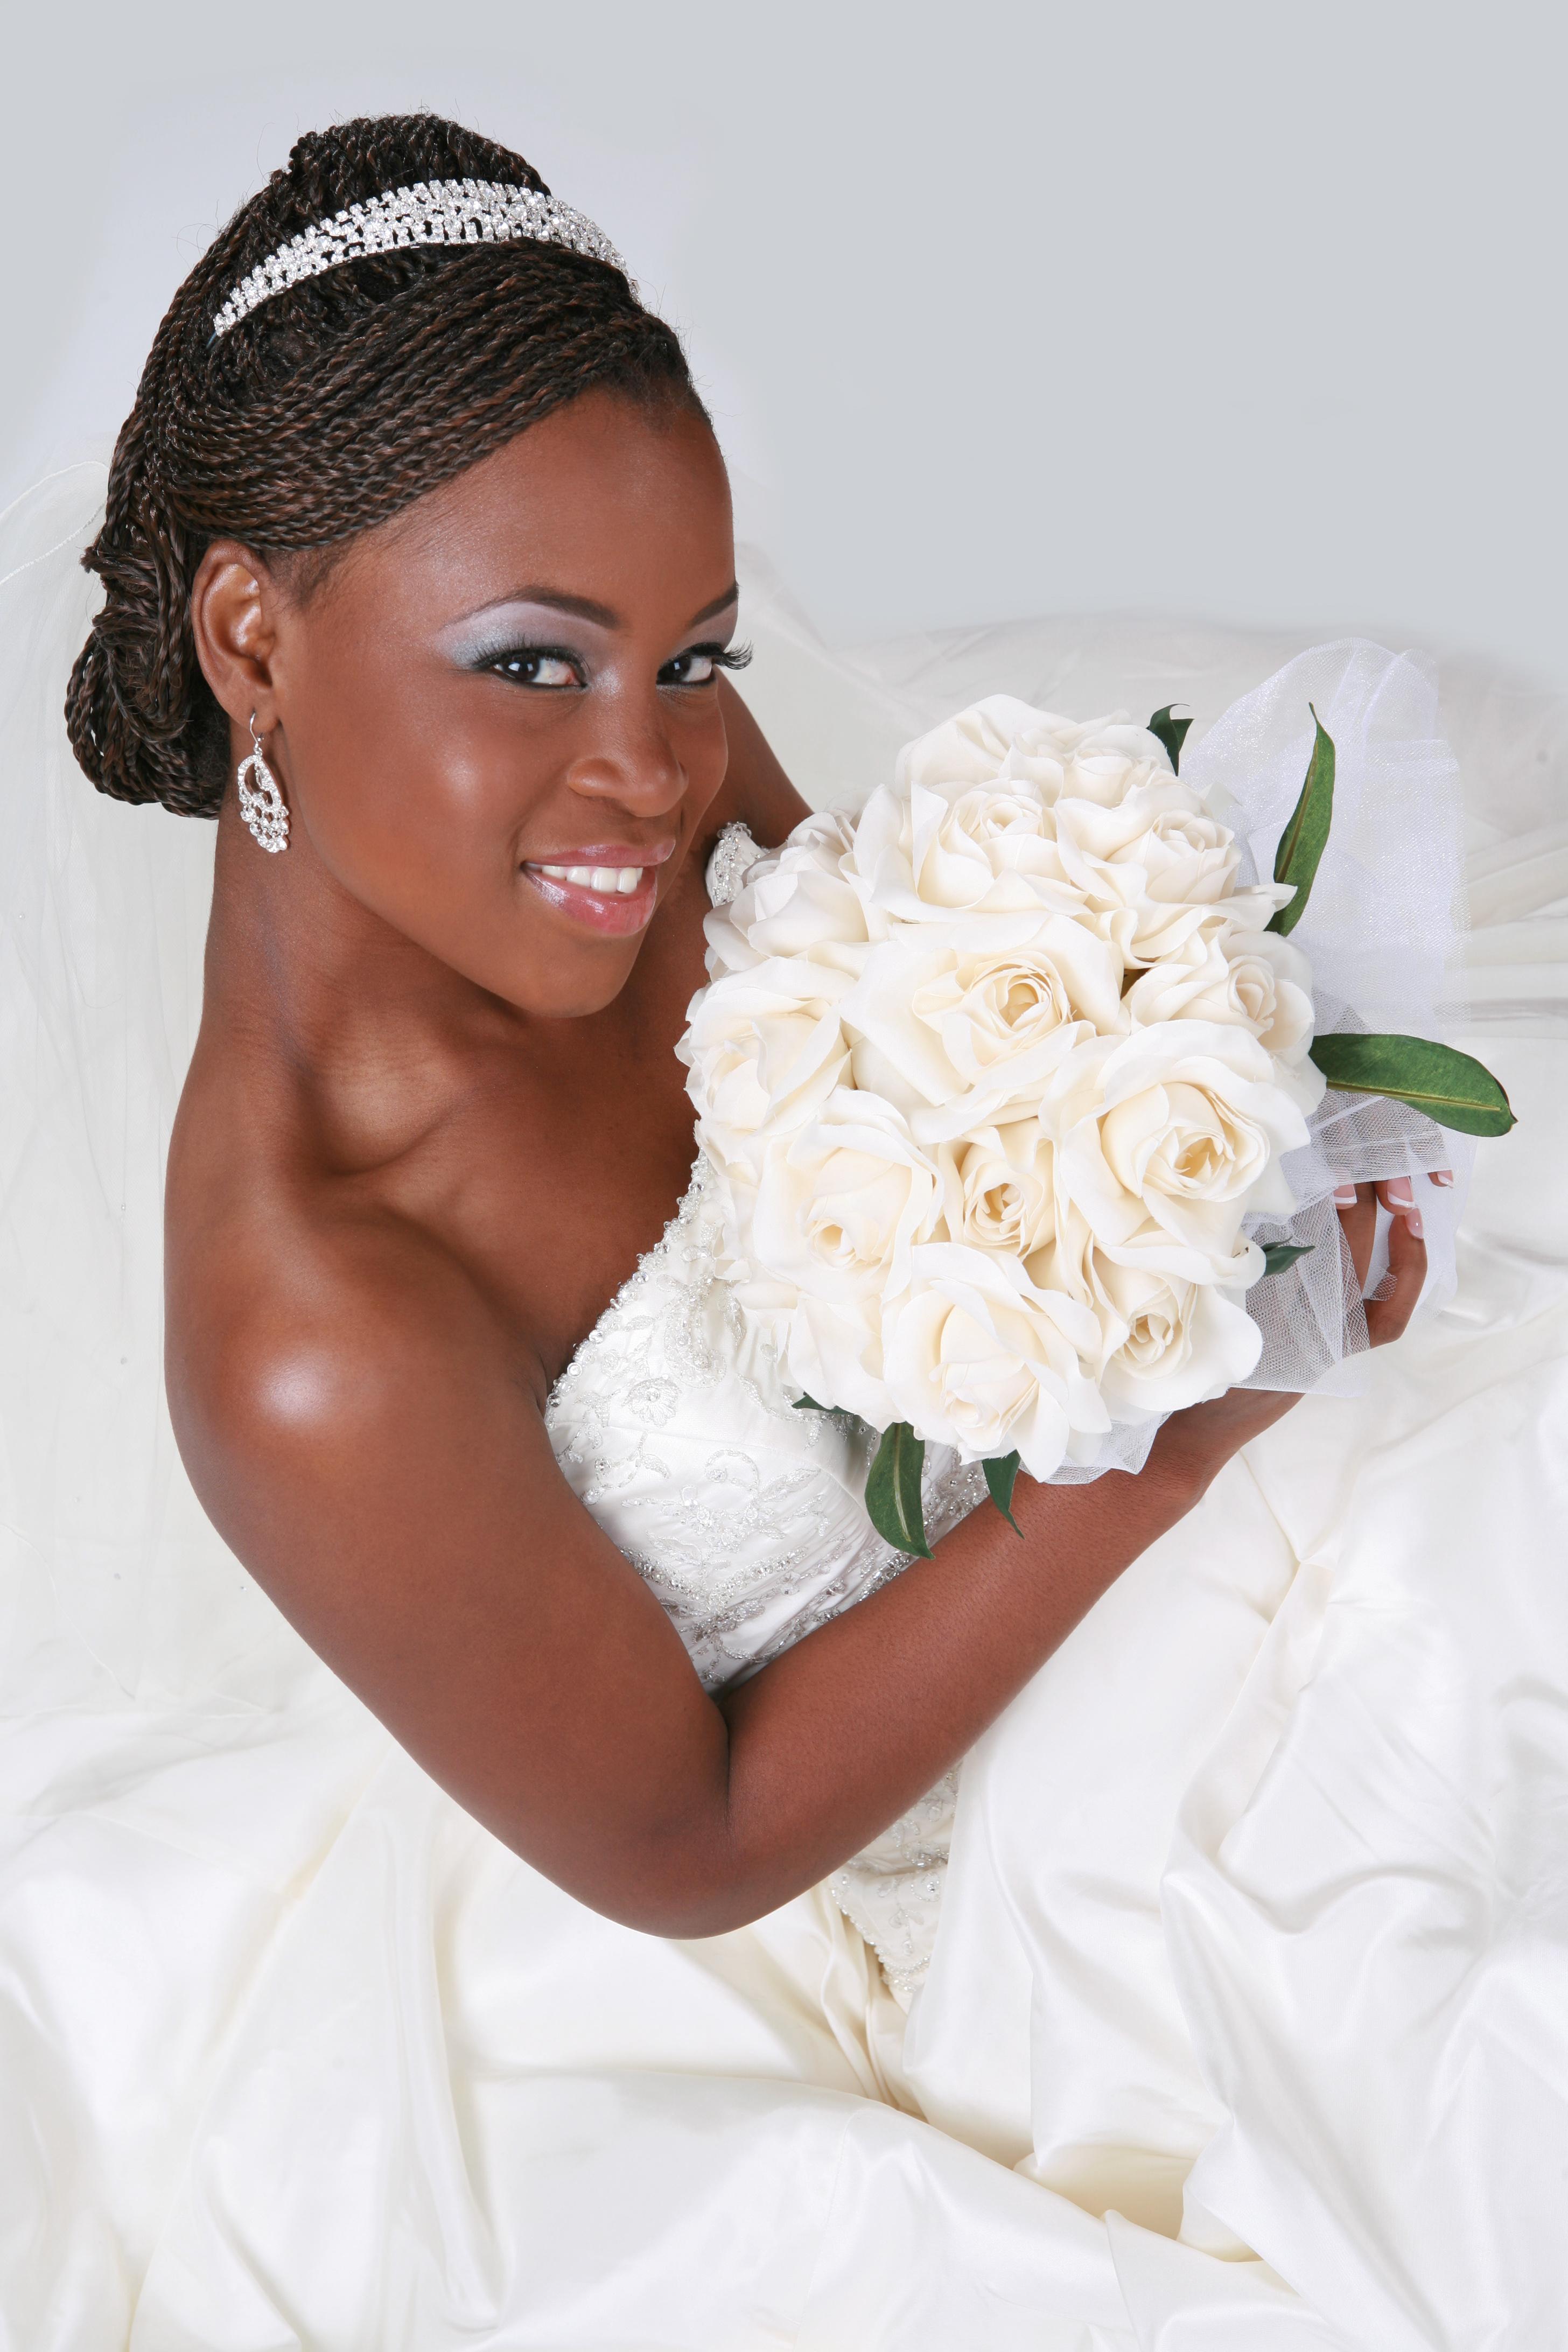 Bride Weddings Natural Hair